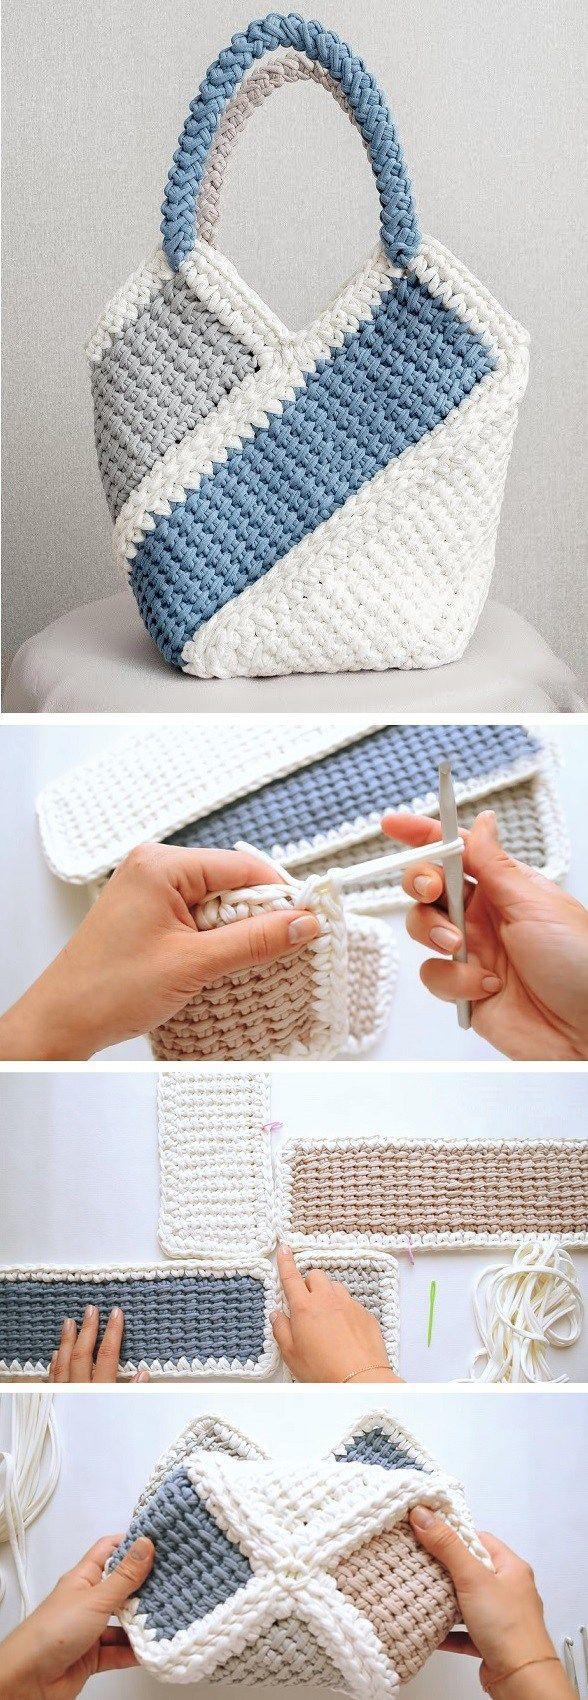 Pretty Lady Bag Crochet Tutorial – Pinturest